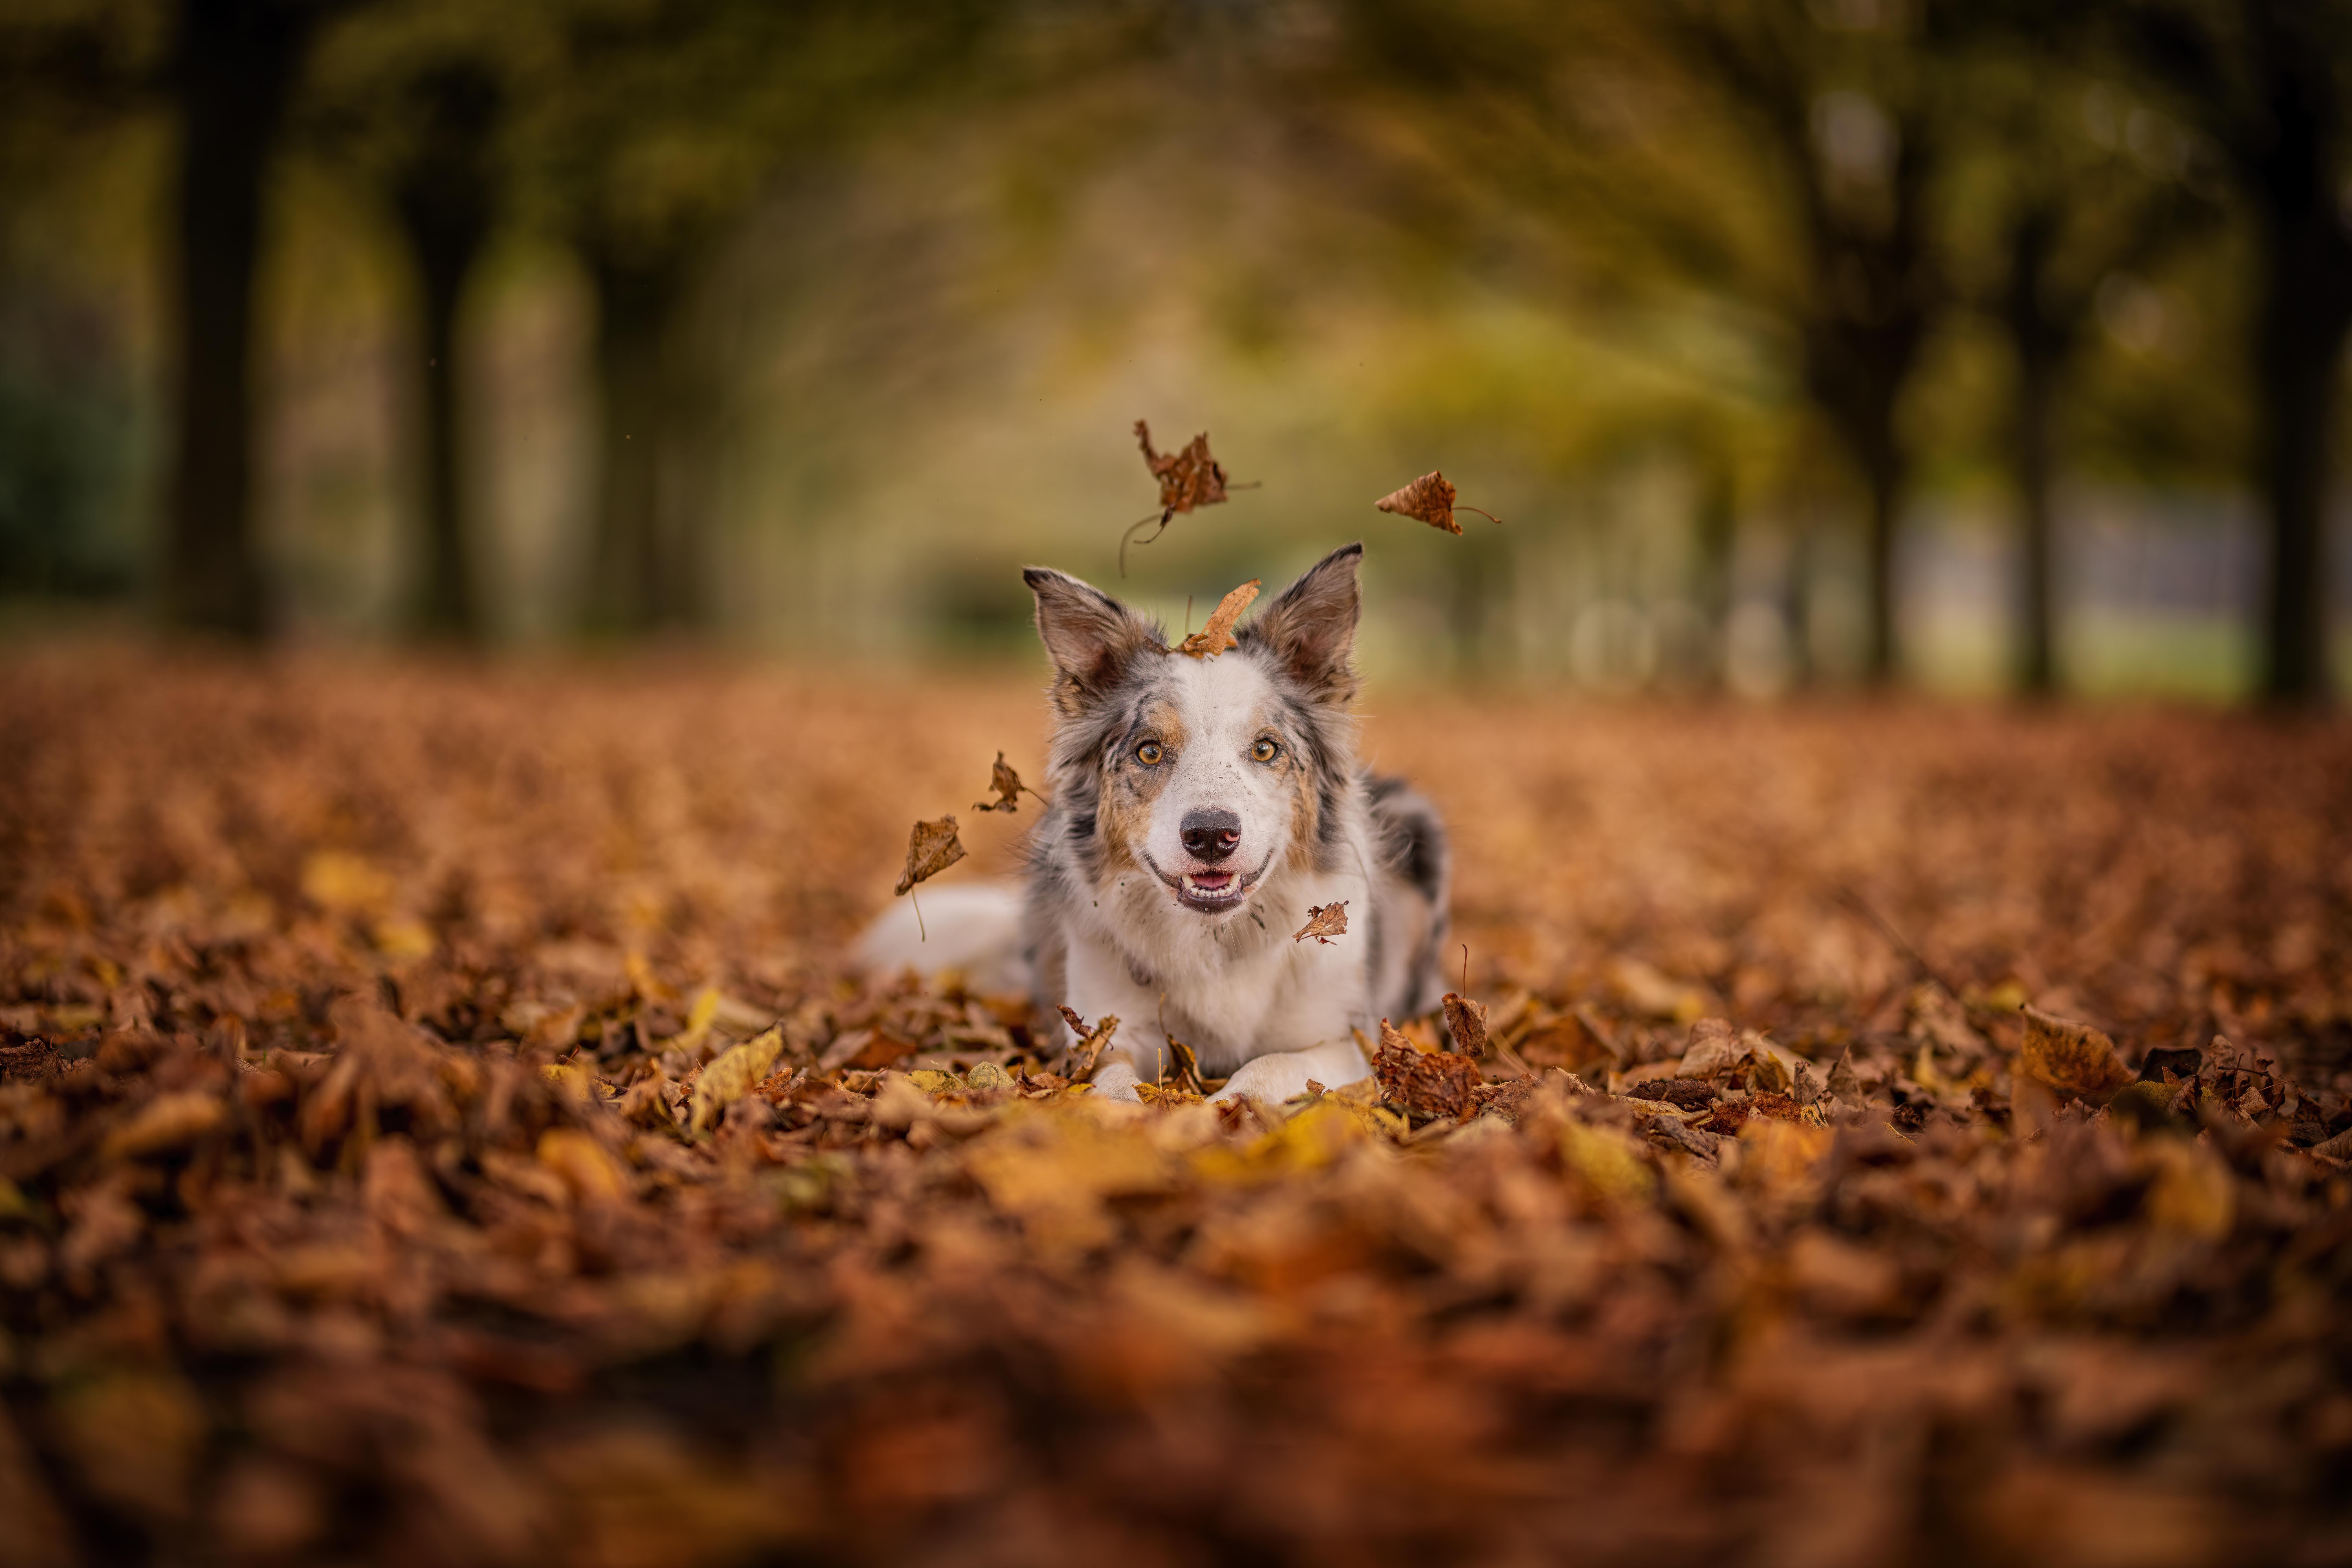 Leafy Passage